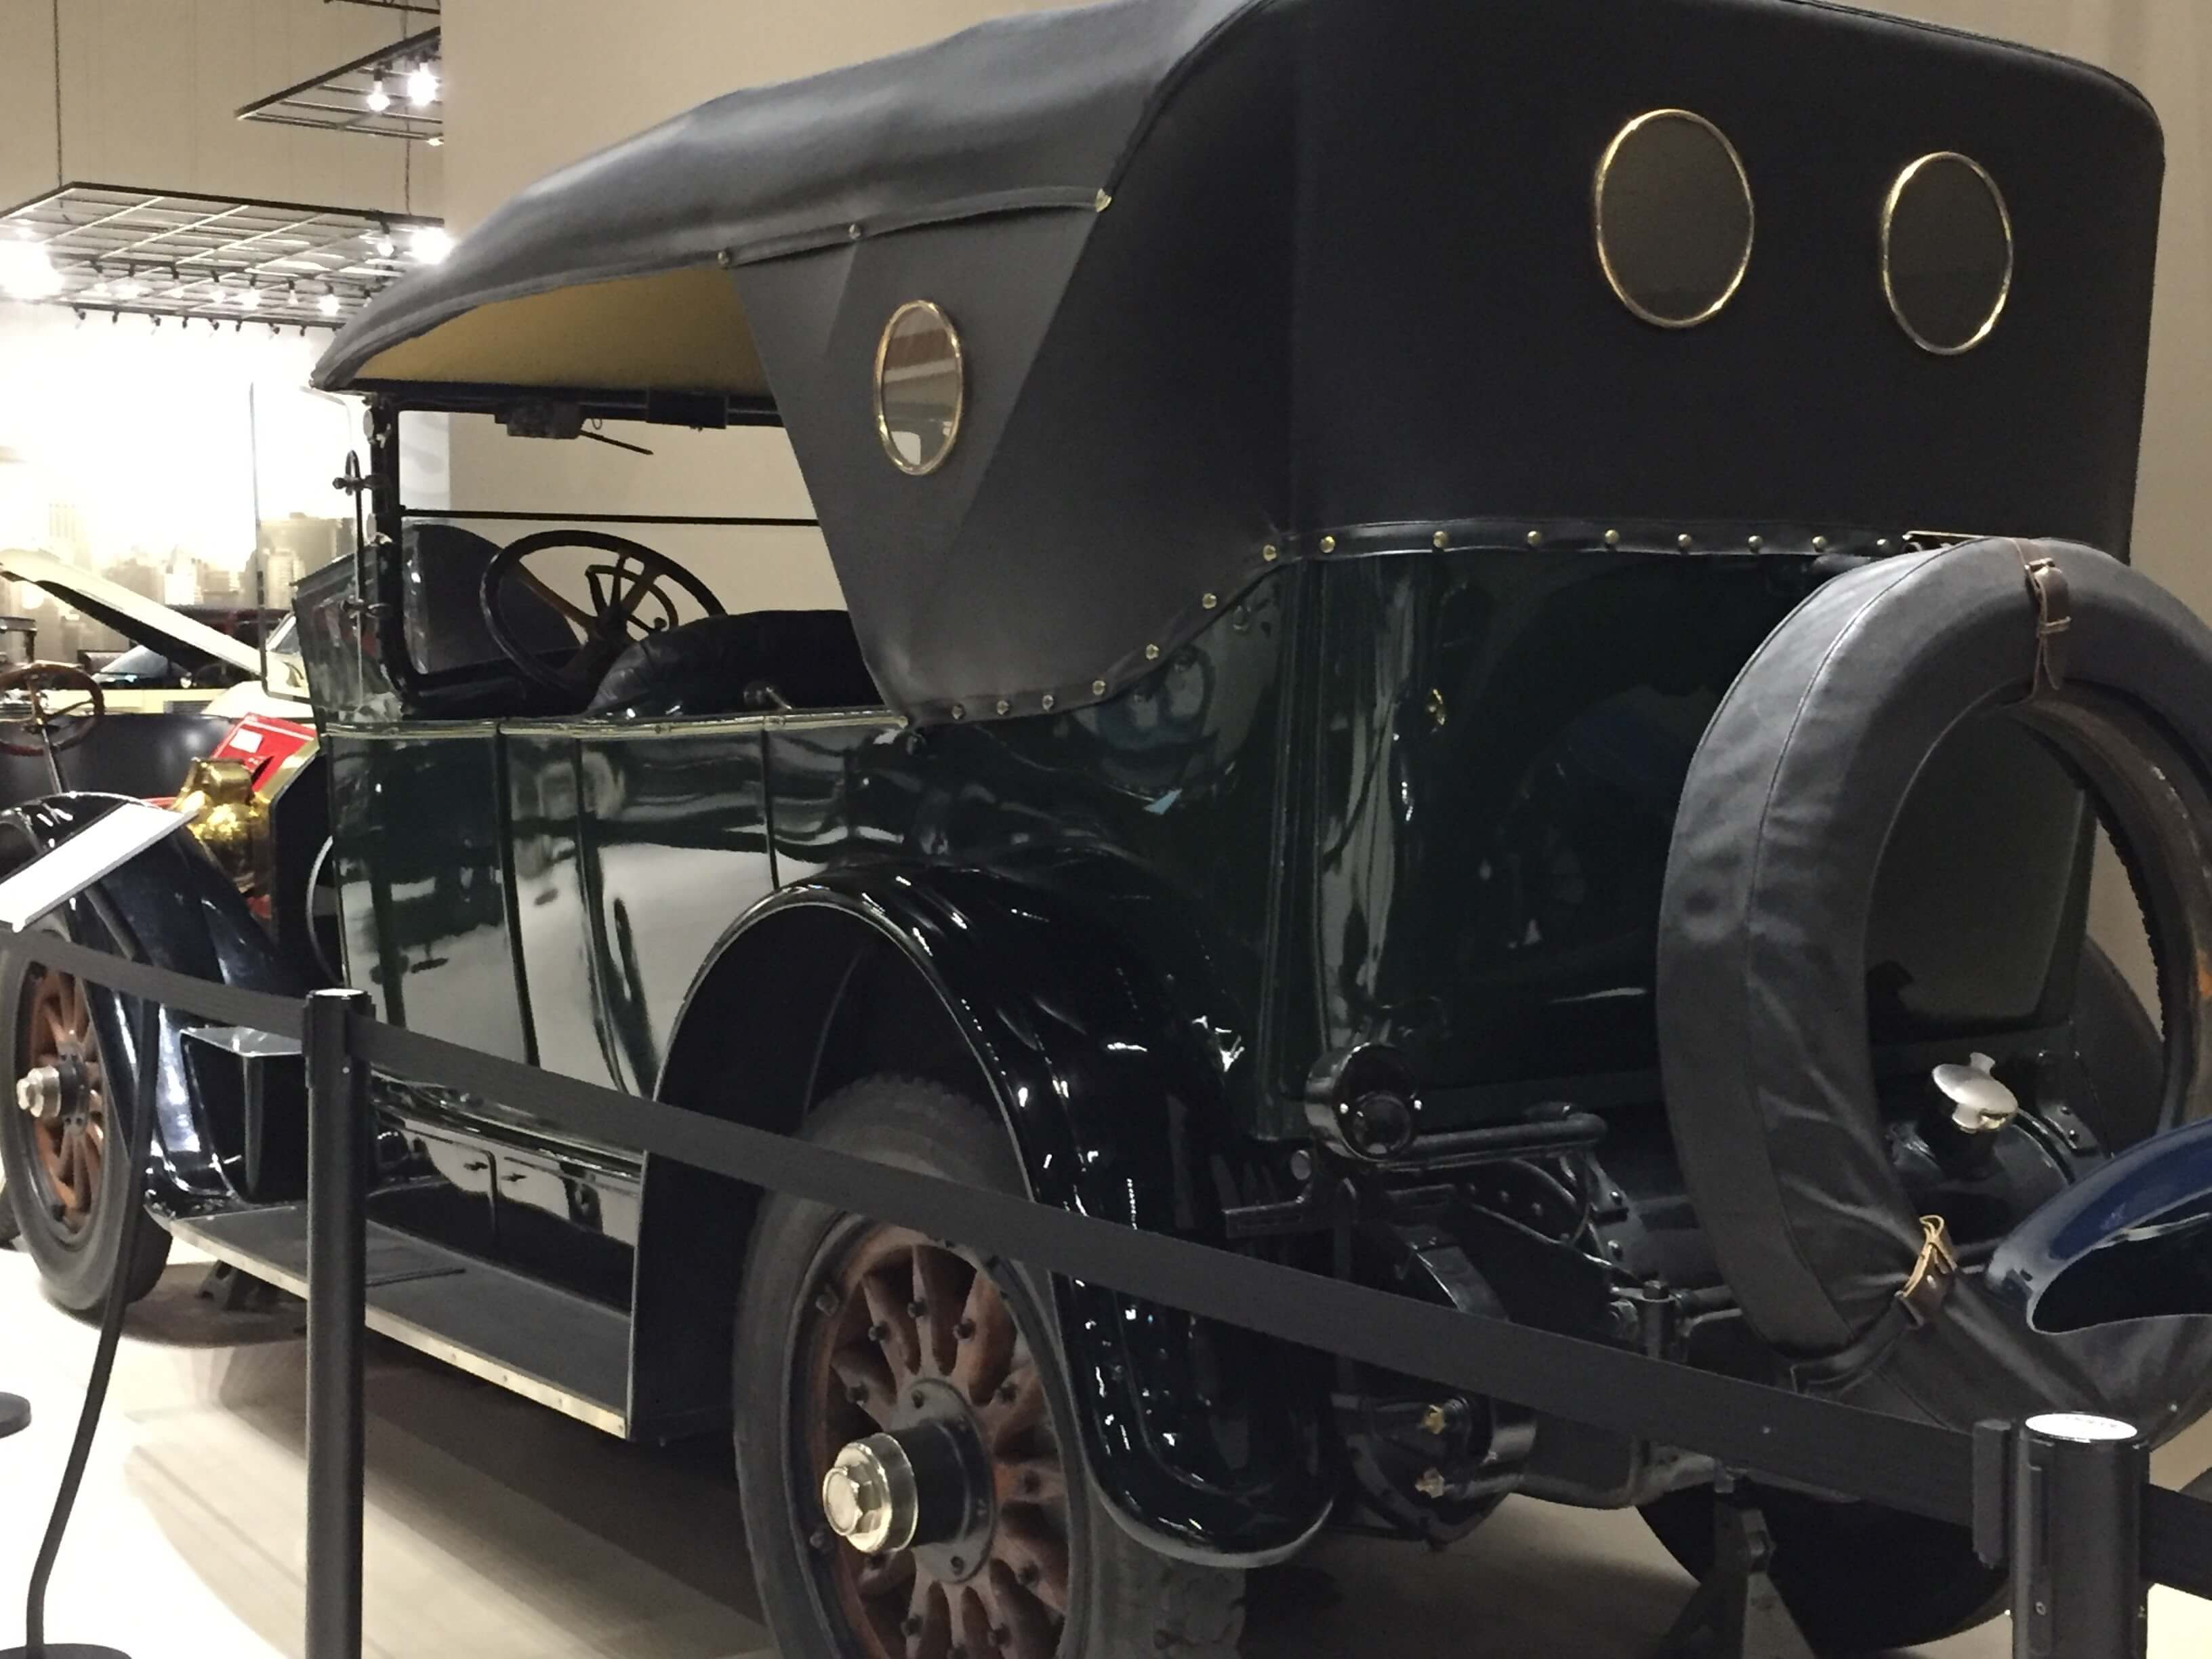 Car museum, Nebraska, 2017